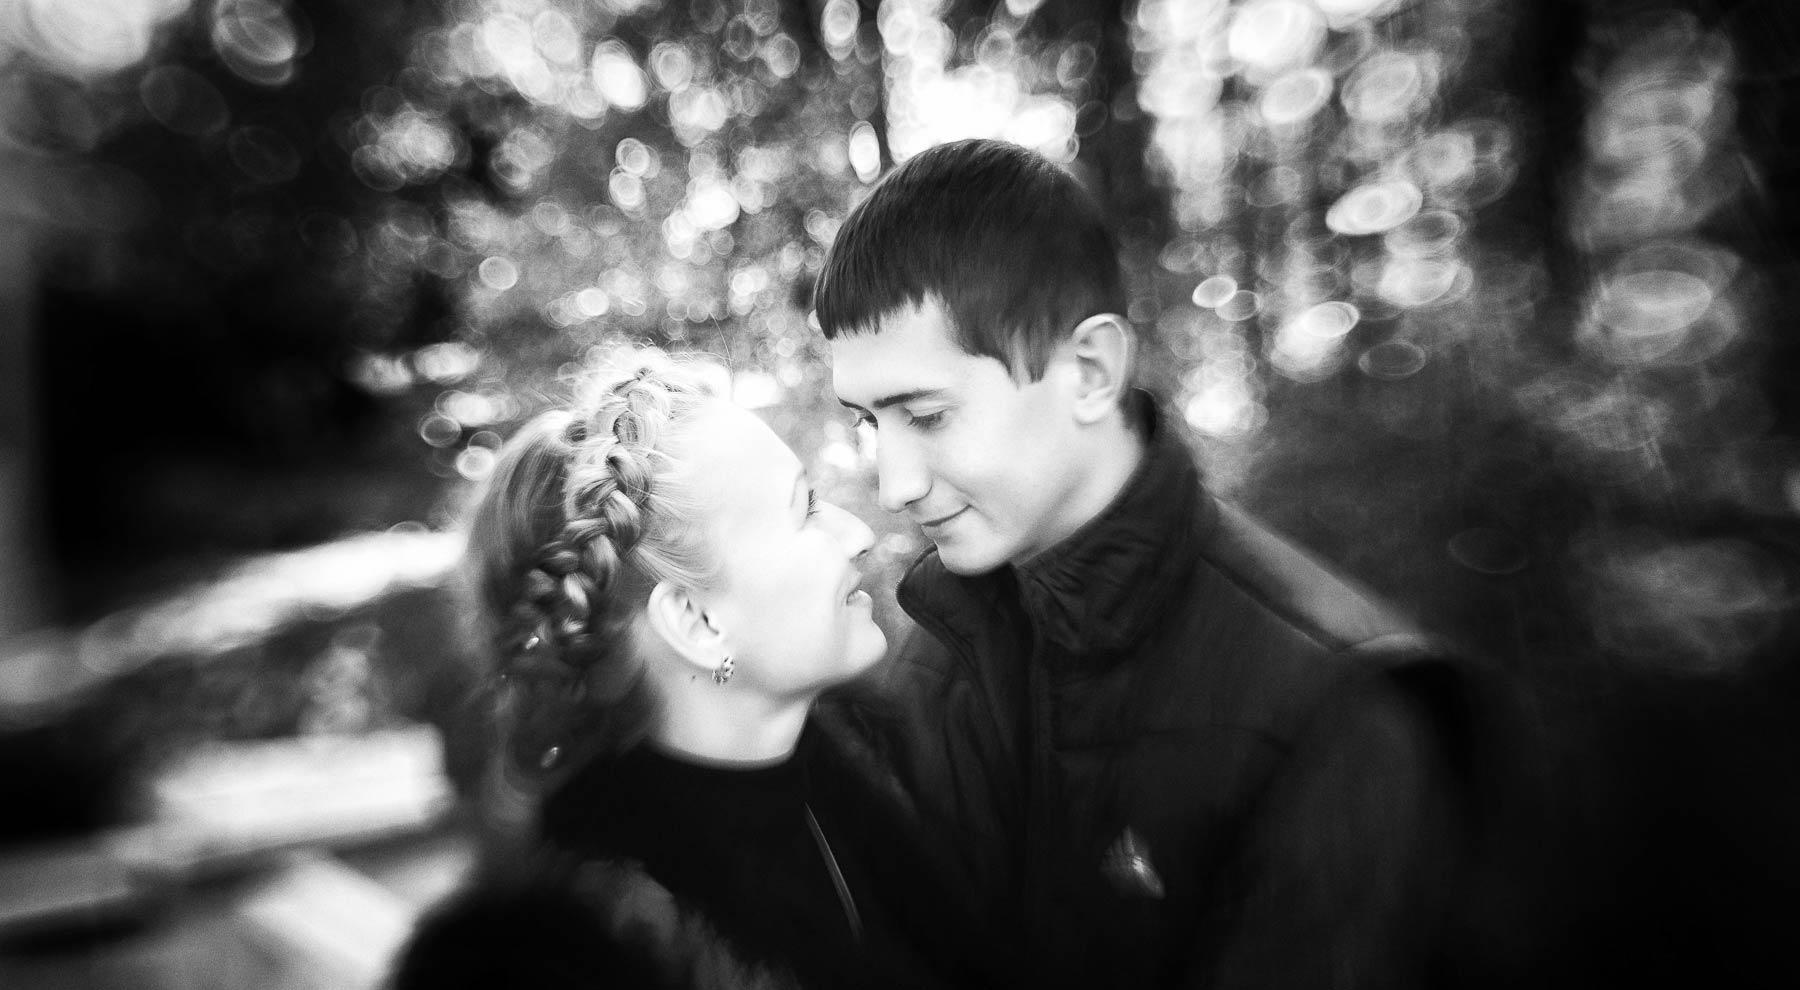 Love story в Москве, Love story в Серпухове, Love story в Чехове, фотограф на Love story Серпухов, фотограф на Love story Москва, фотограф на Love story Чехов